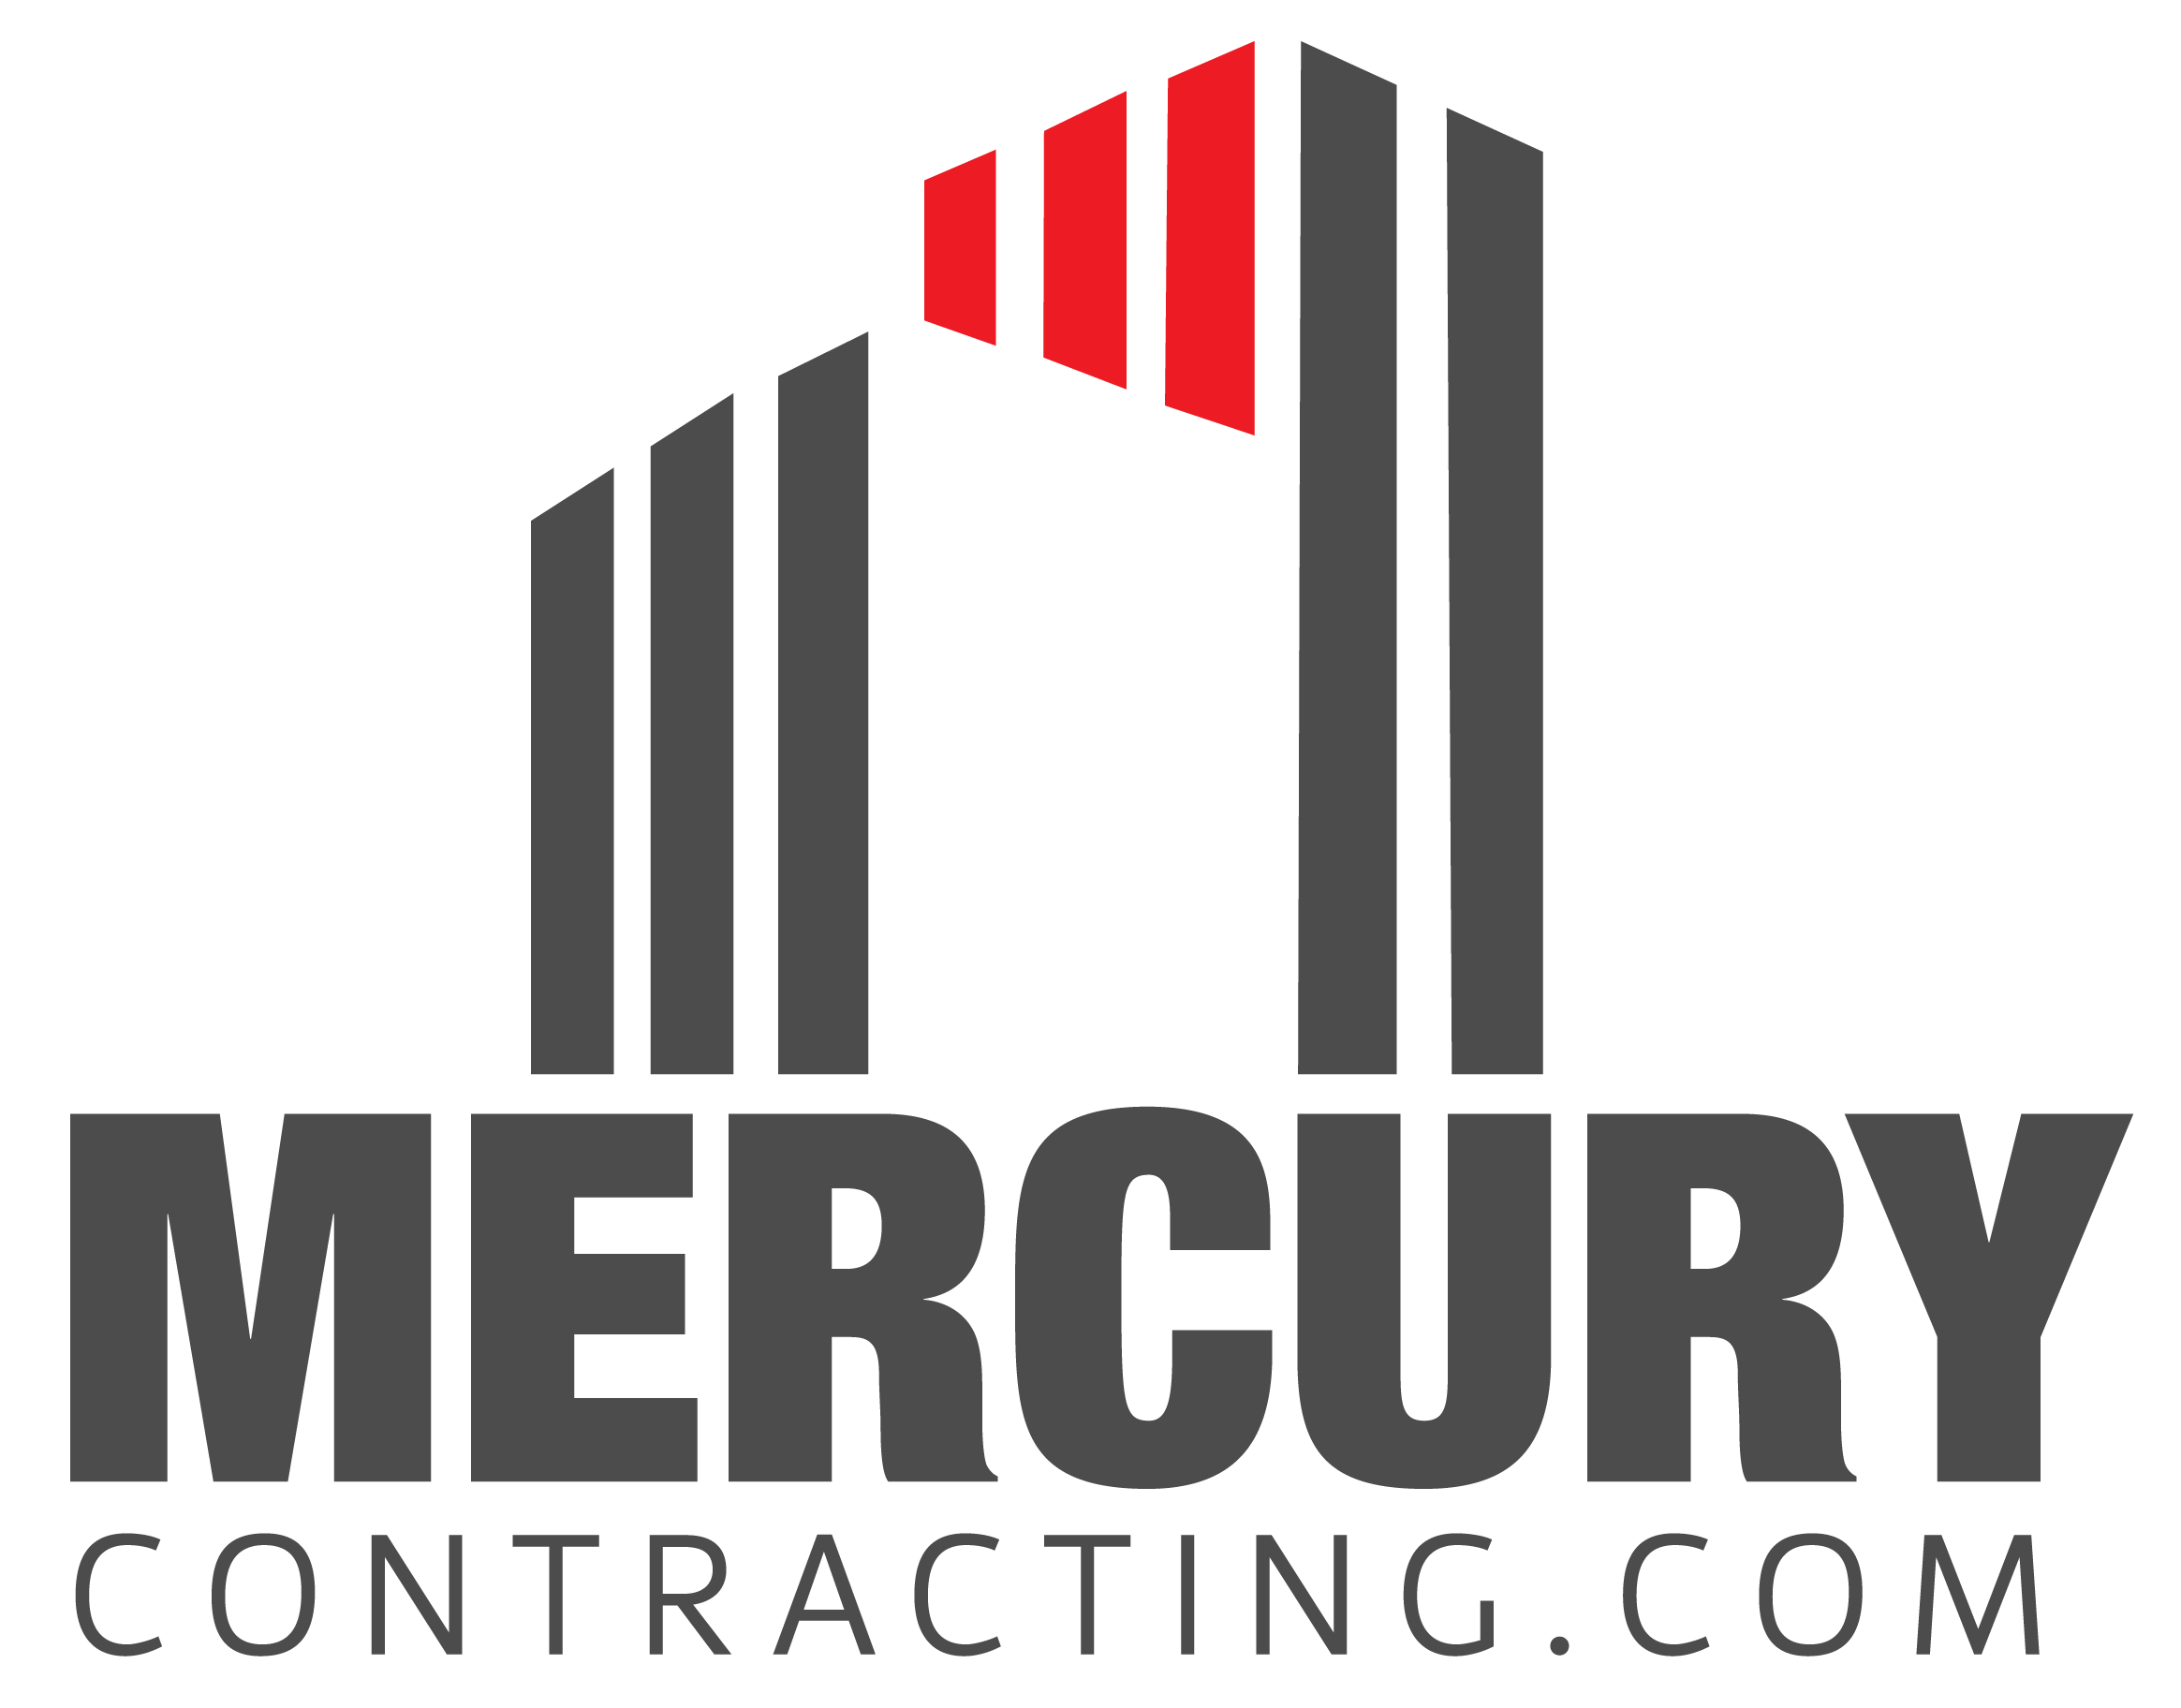 Mercury-Conracting-Logo.png